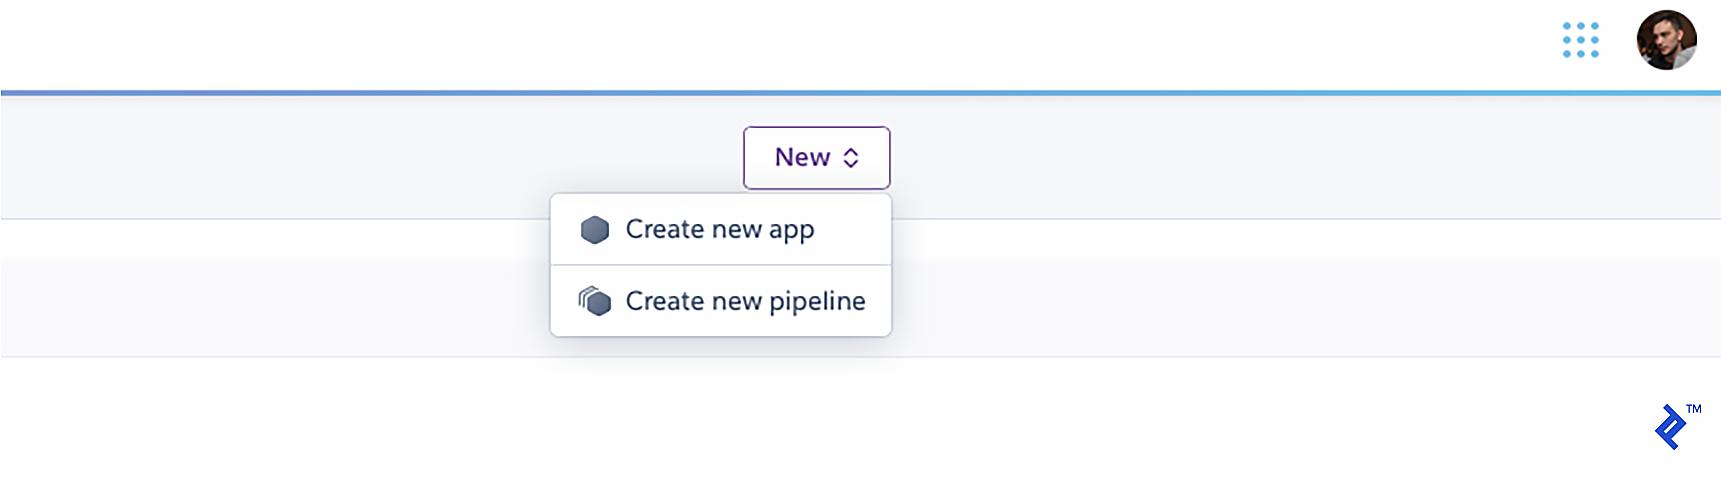 "Choosing ""Create new app"" from the New menu in the Heroku dashboard."